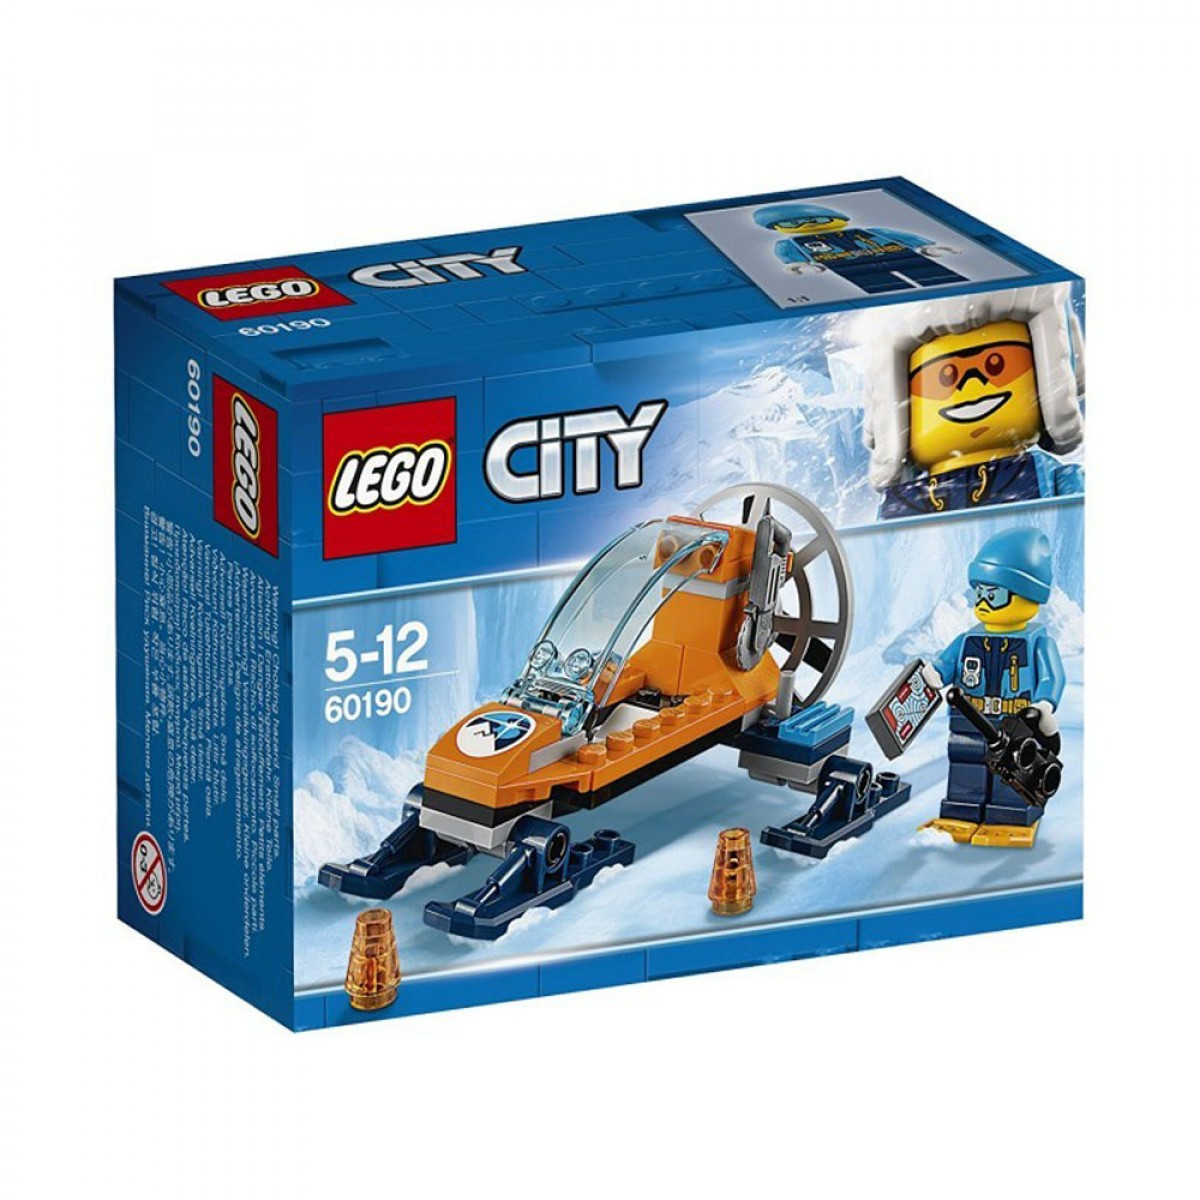 LEGO CITY ARTIC ICE GLIDER 60190